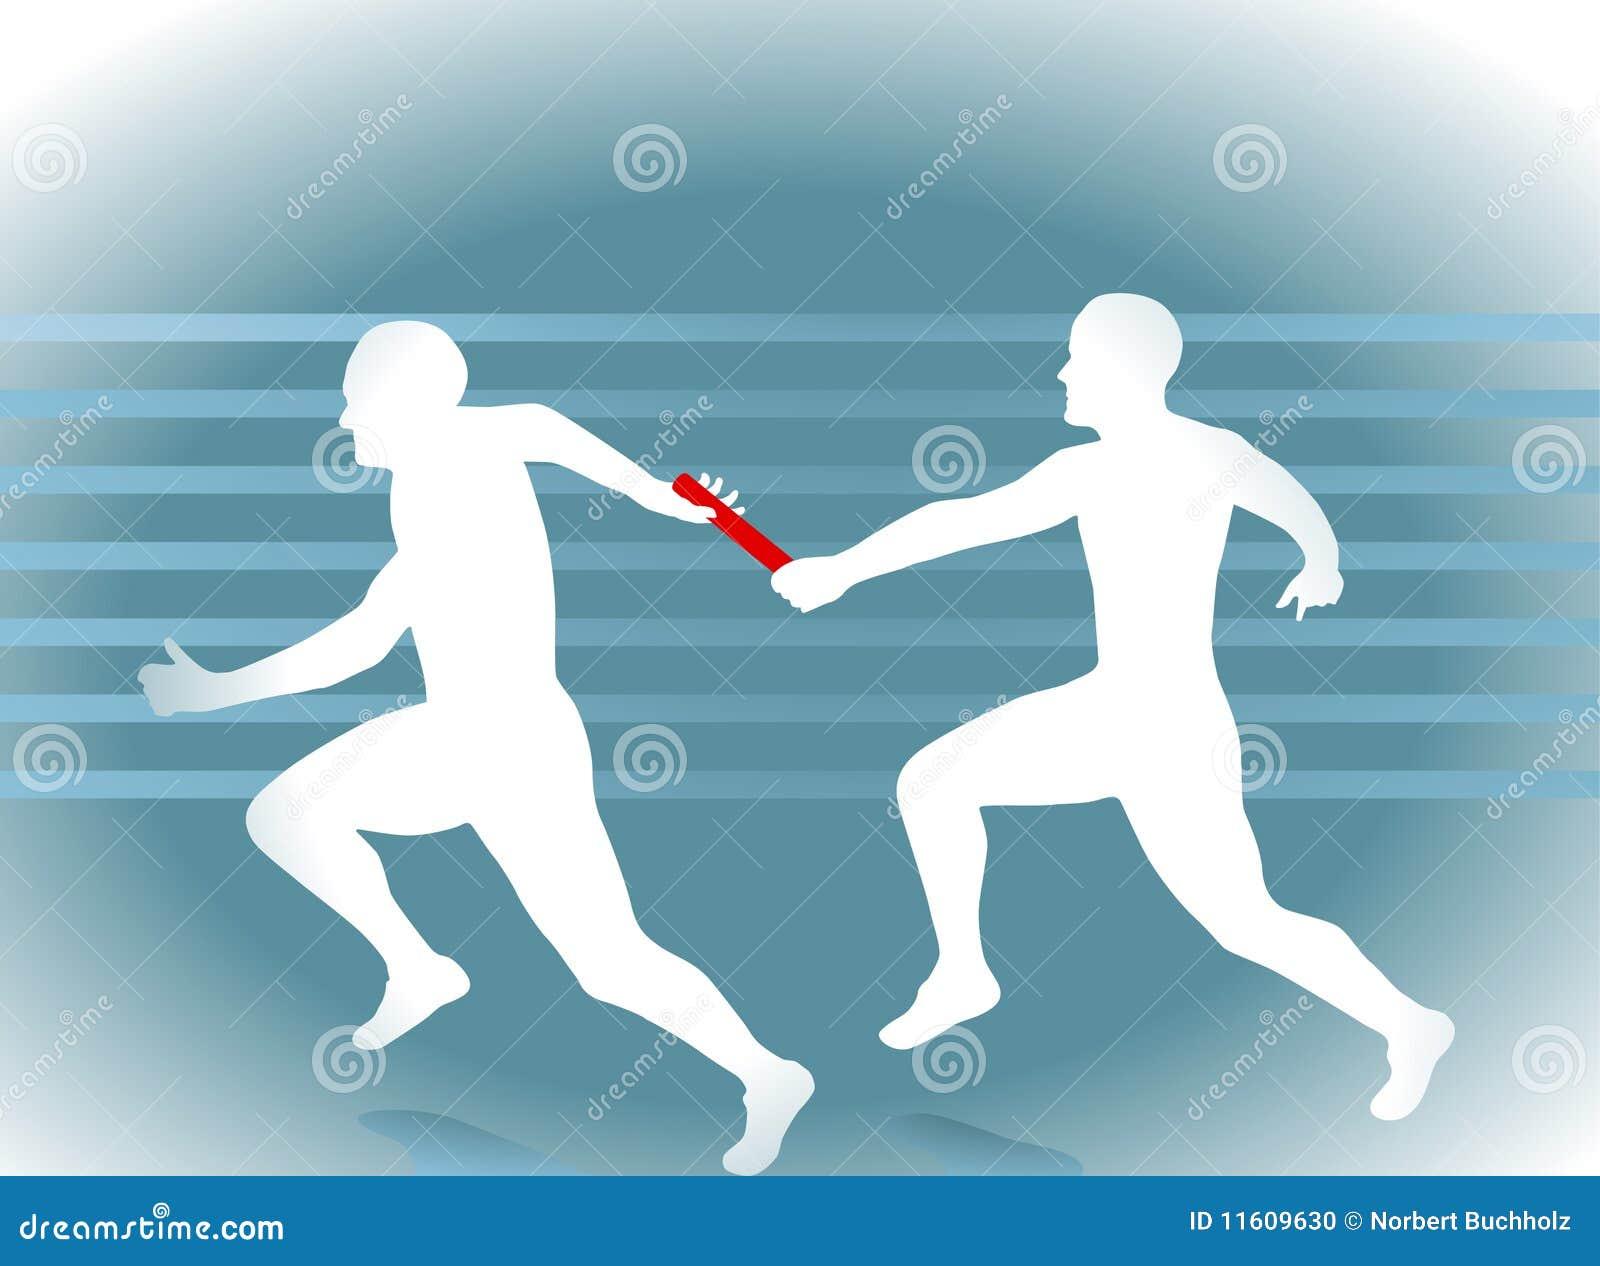 Relay Running on Web Relay 1 0